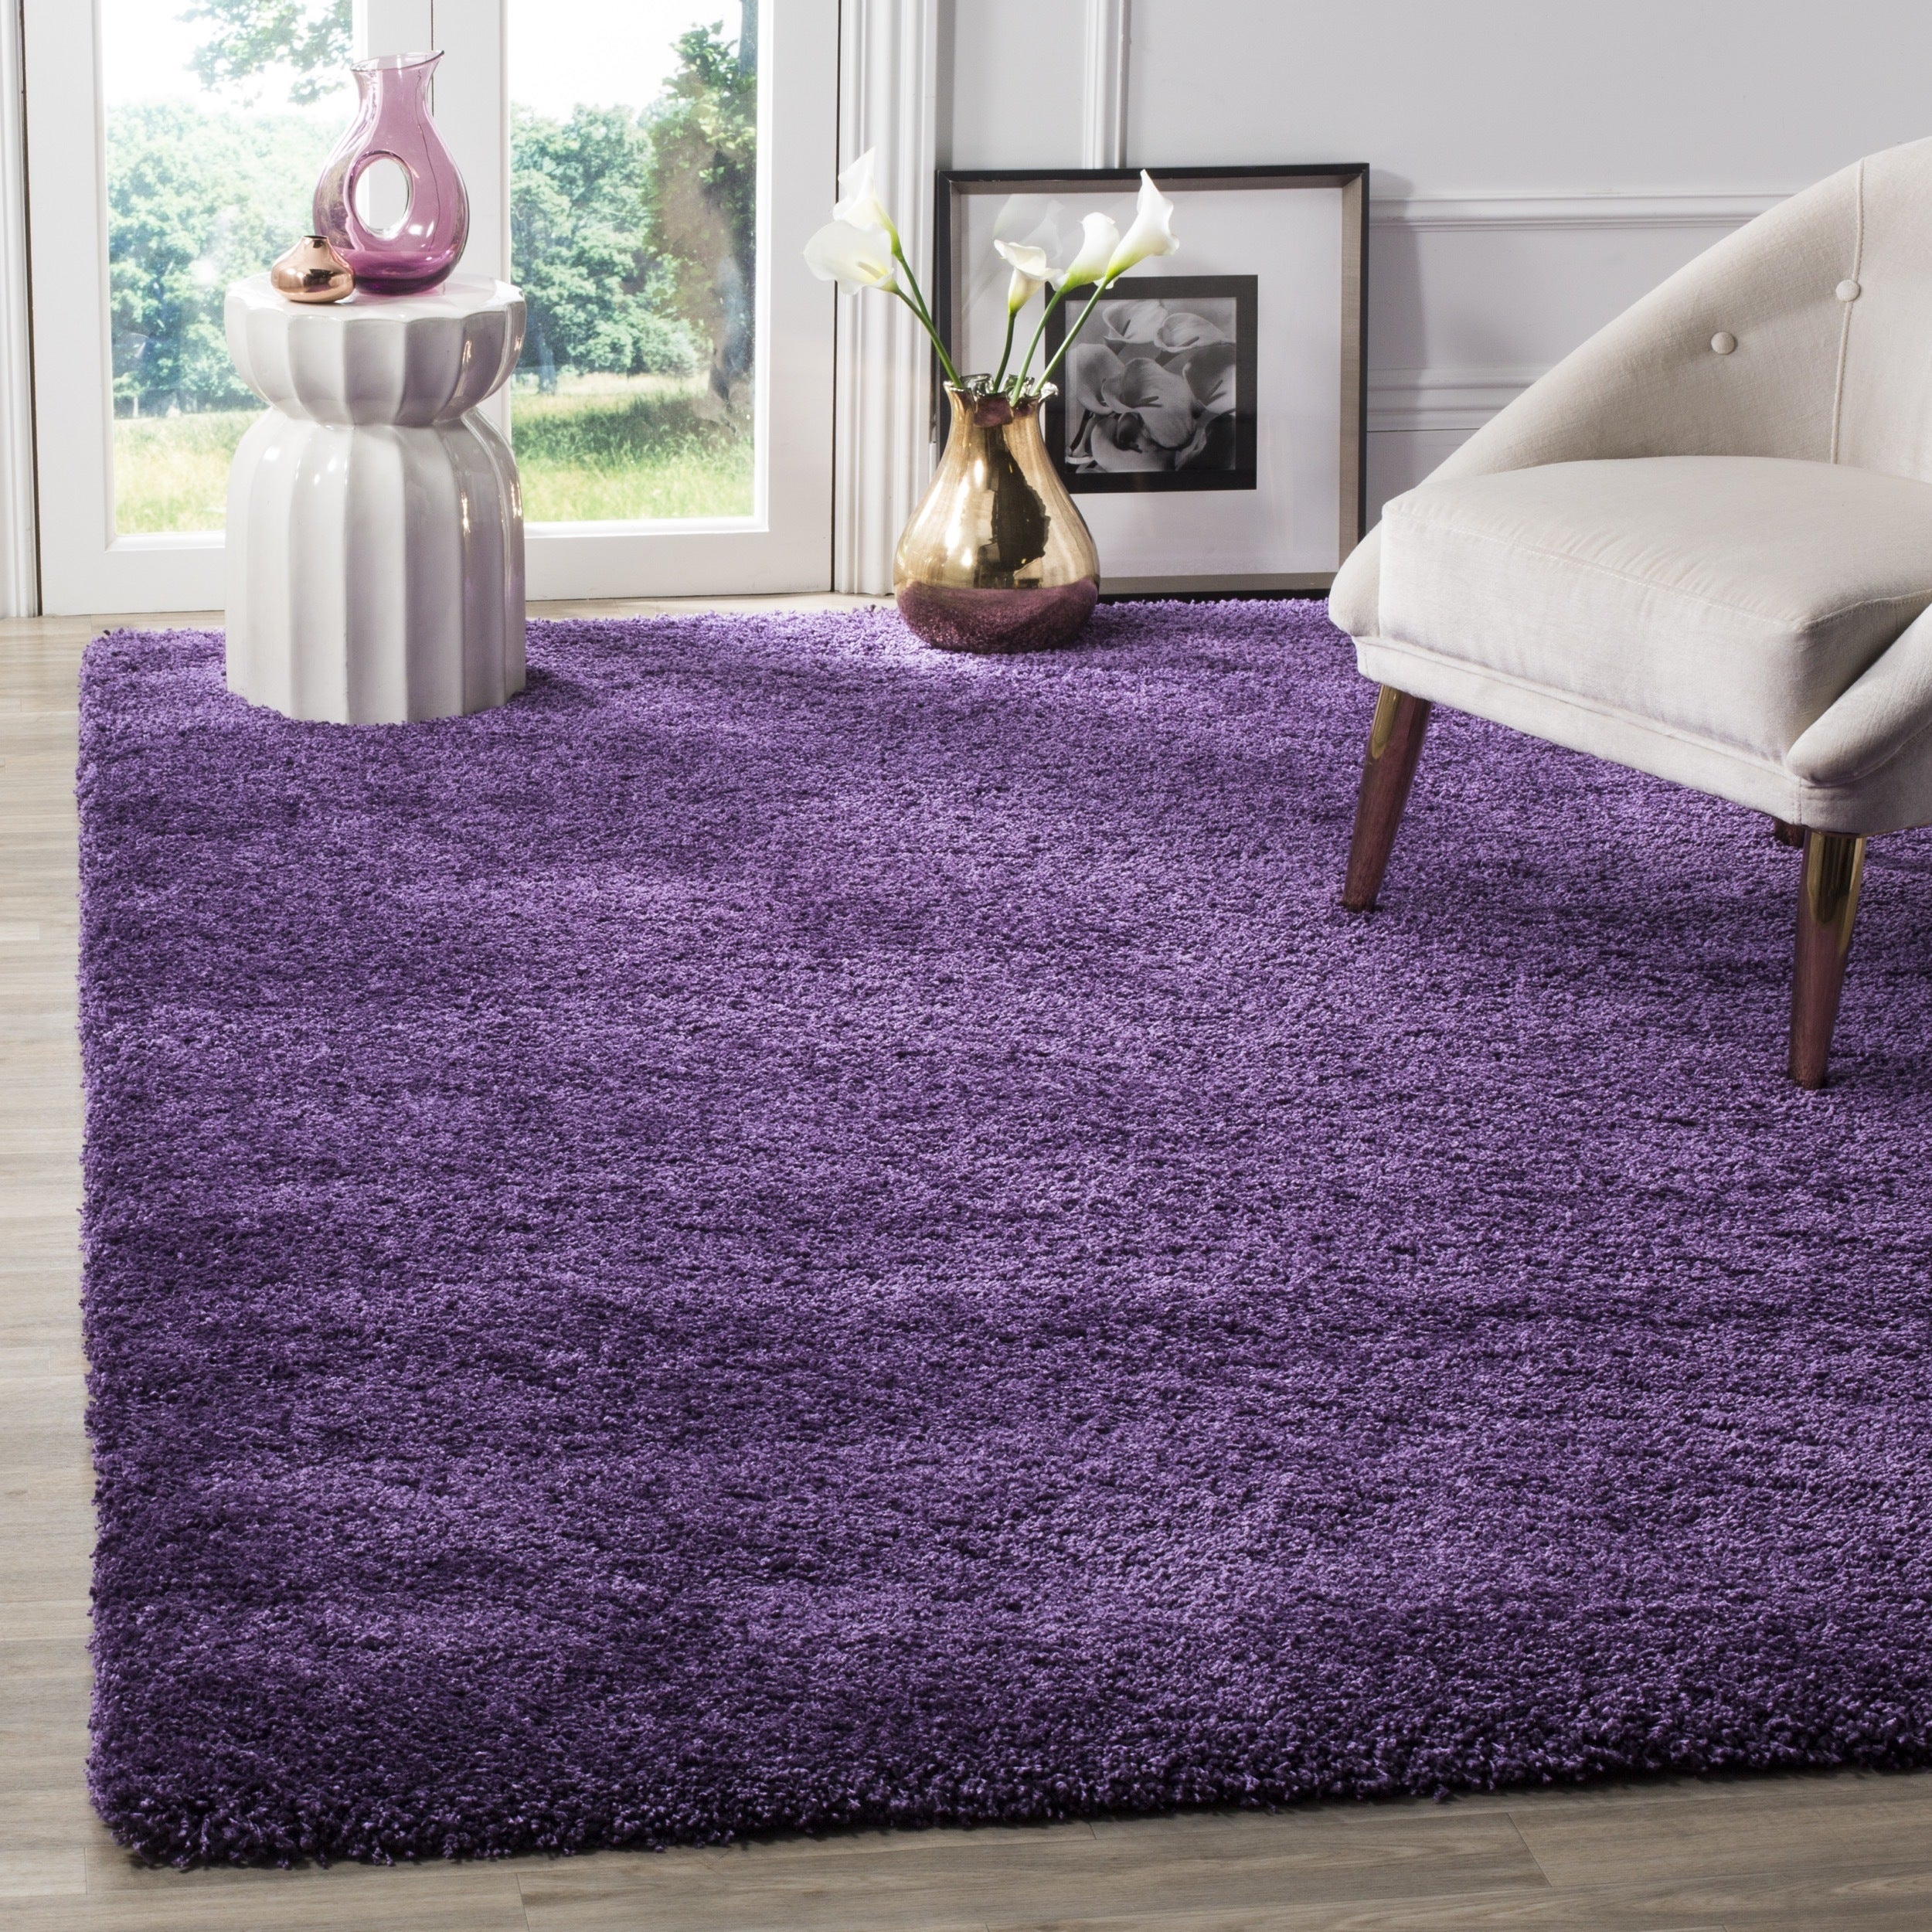 safavieh milan shag purple rug 8u0027 x